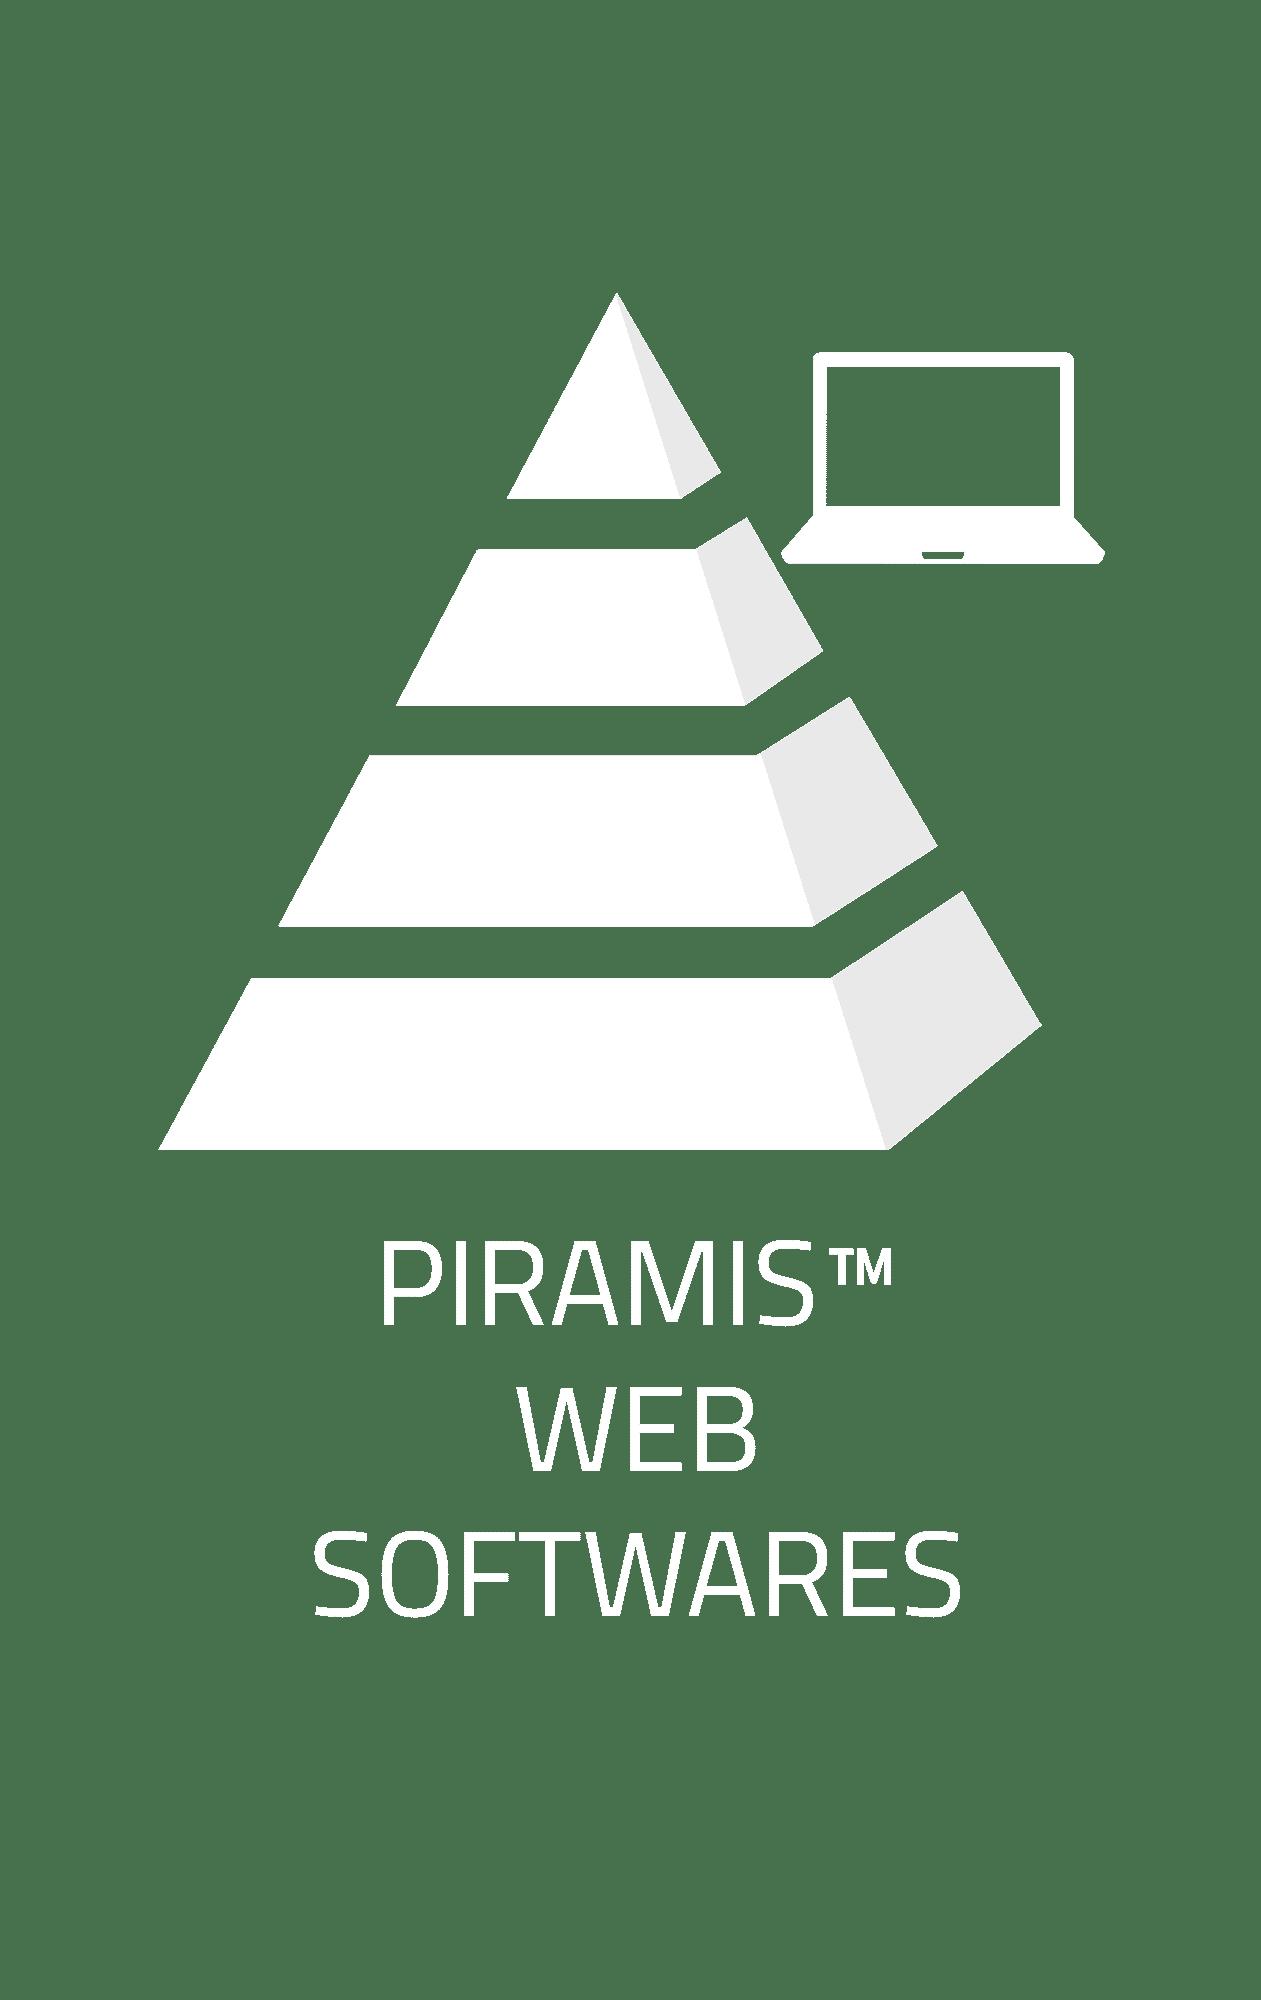 PIRAMIS™ Web Softwares